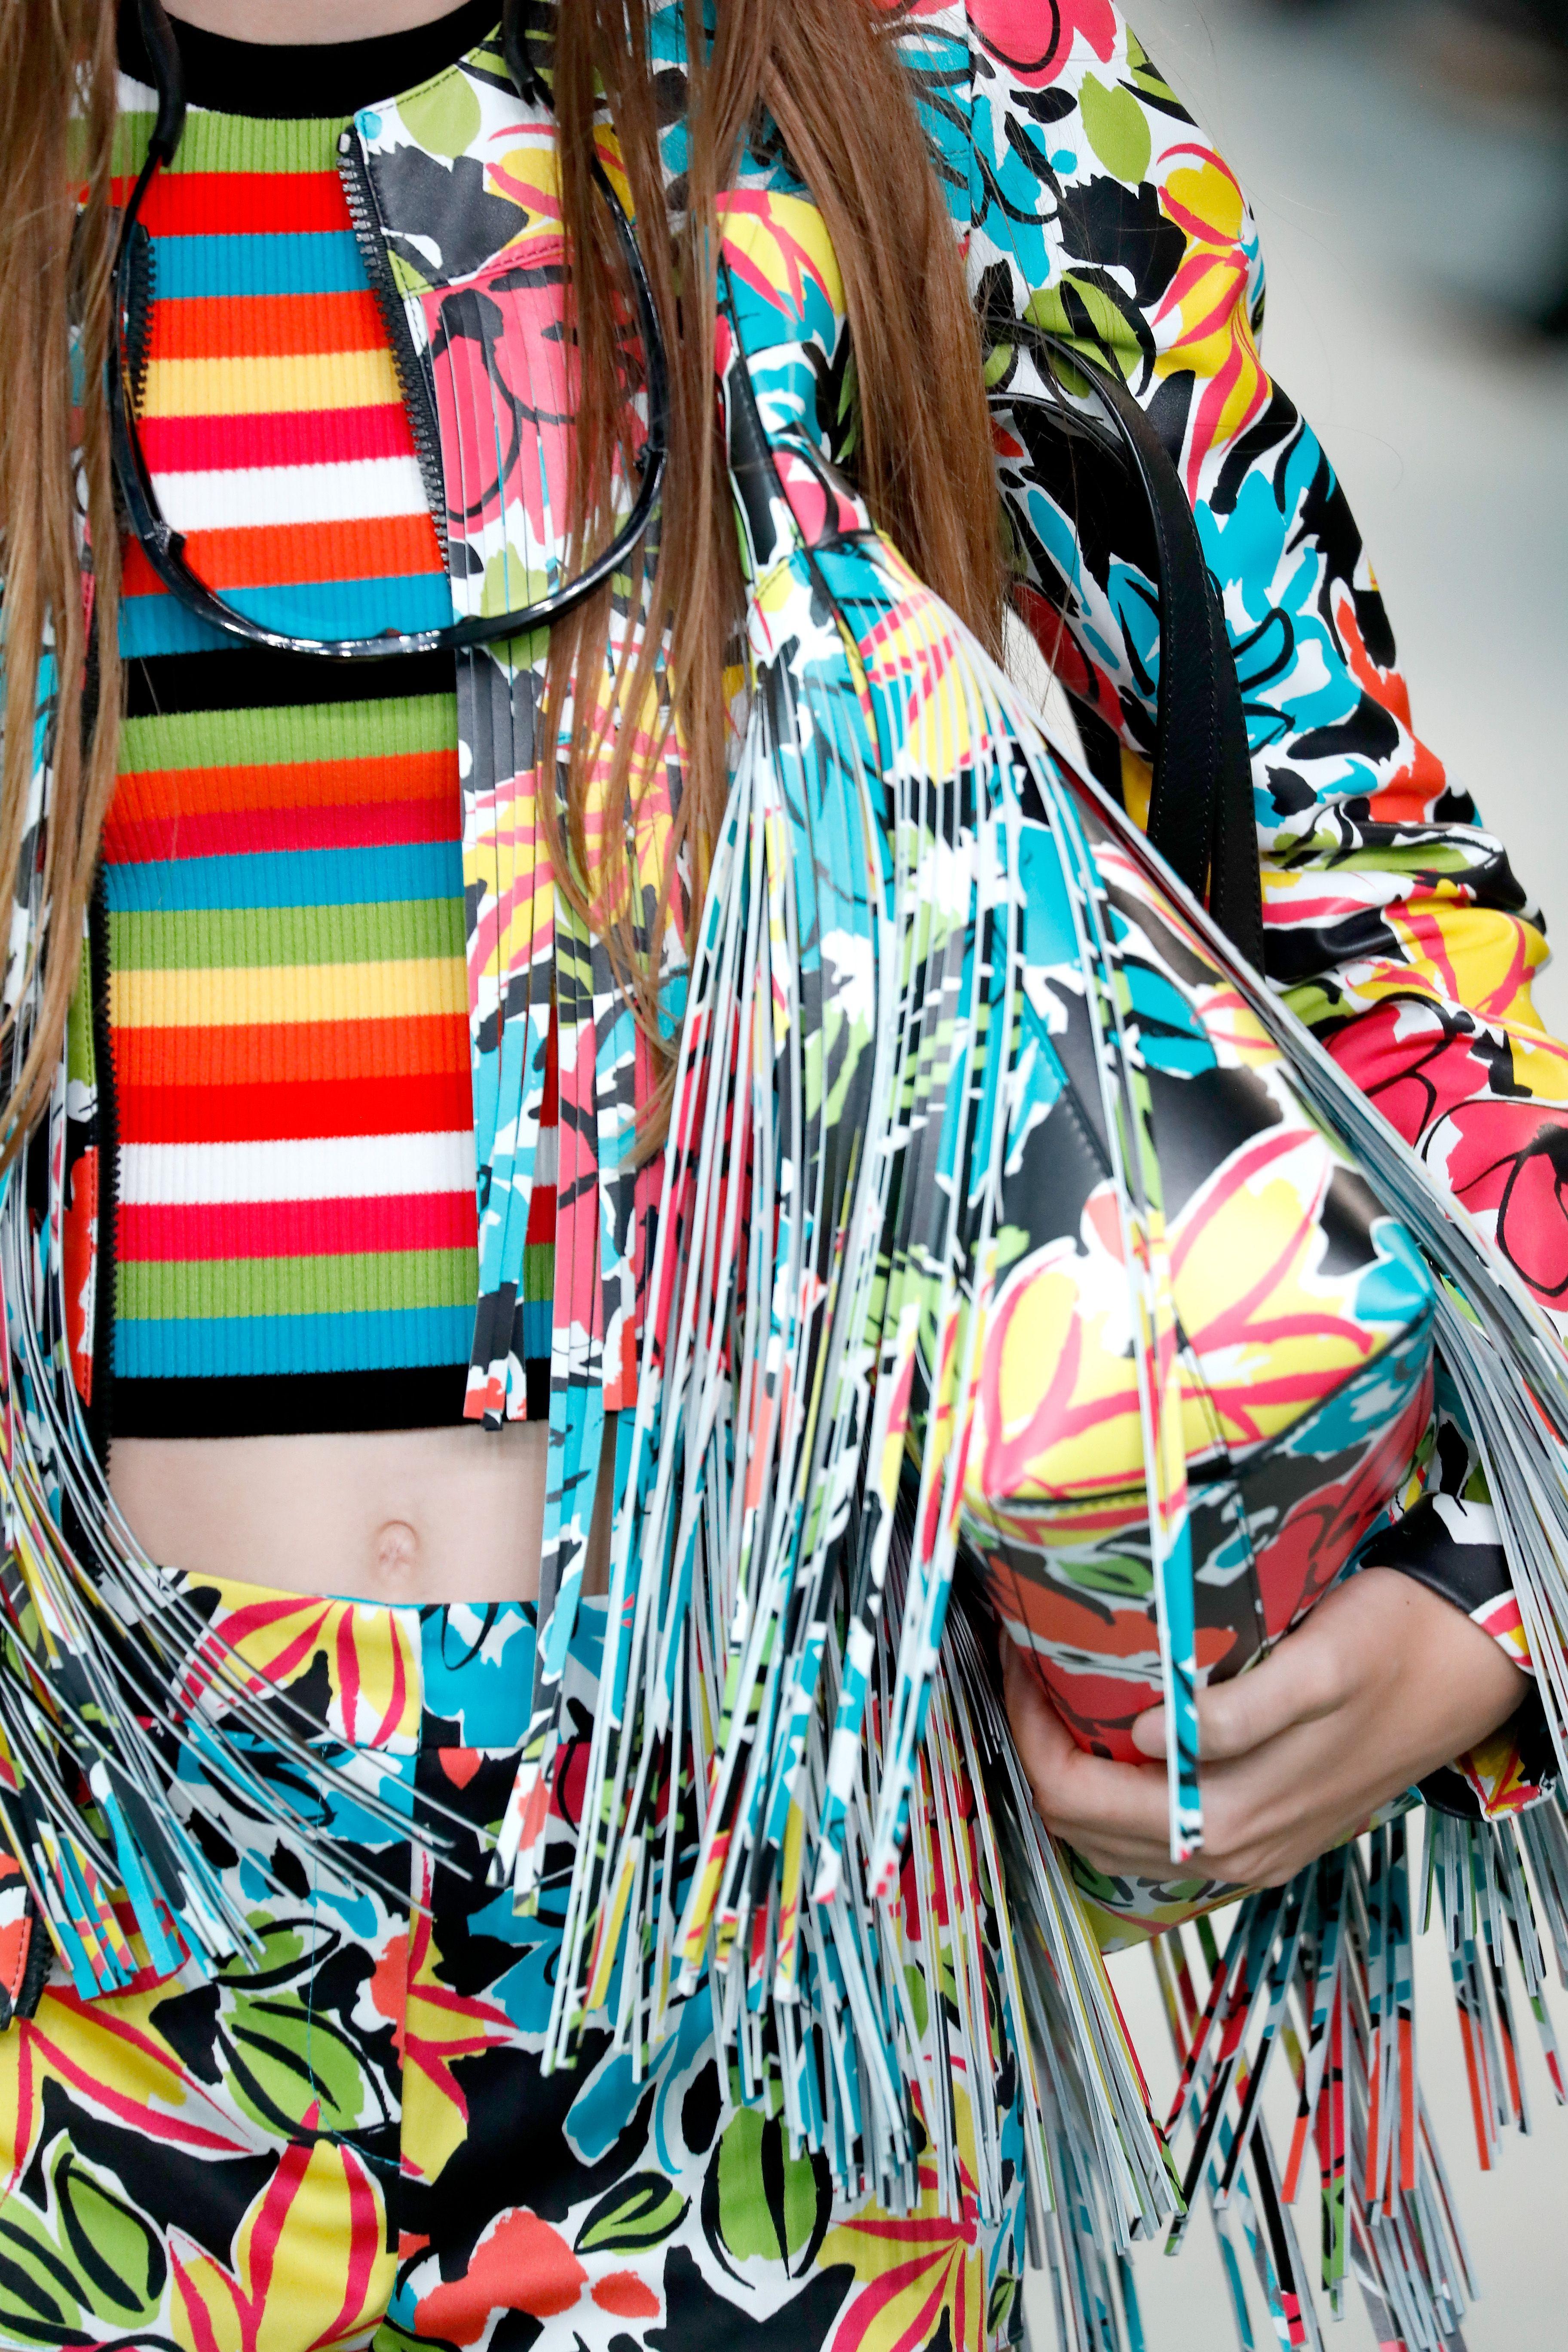 Spring Summer 2019 Bag Trends - The Biggest Bag Trends of SS19 425f2248c7520